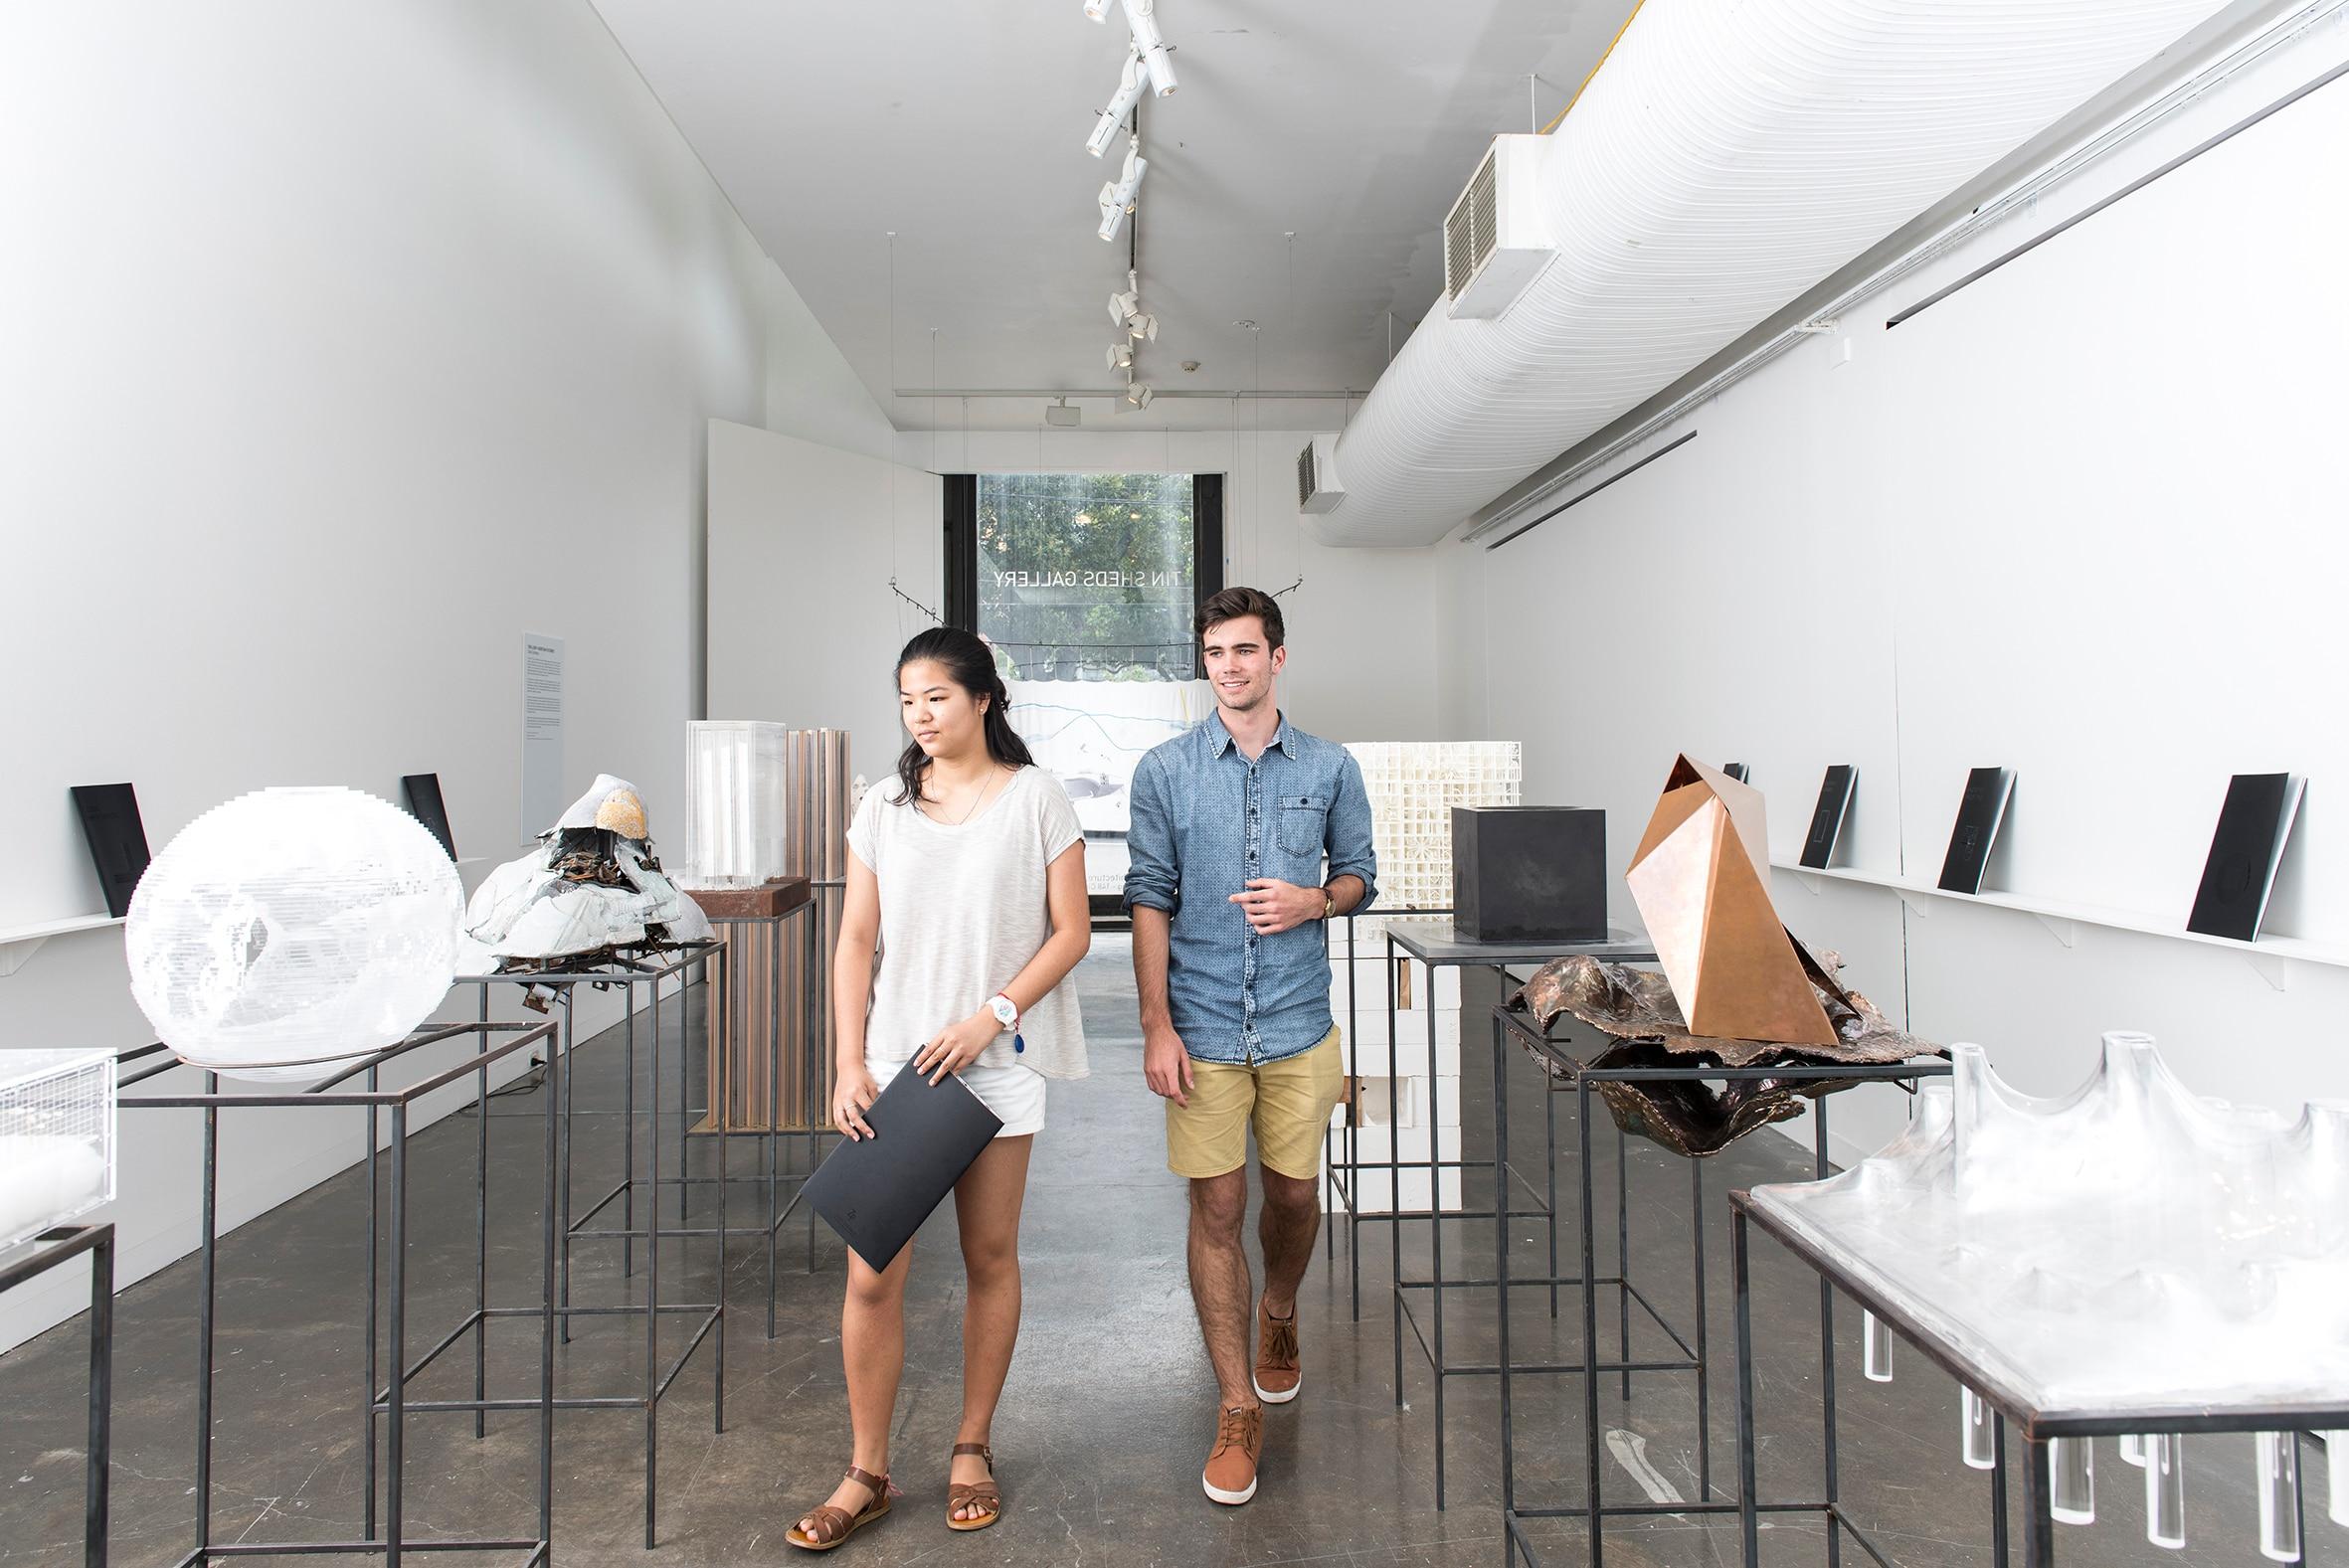 interior design course sydney university admission